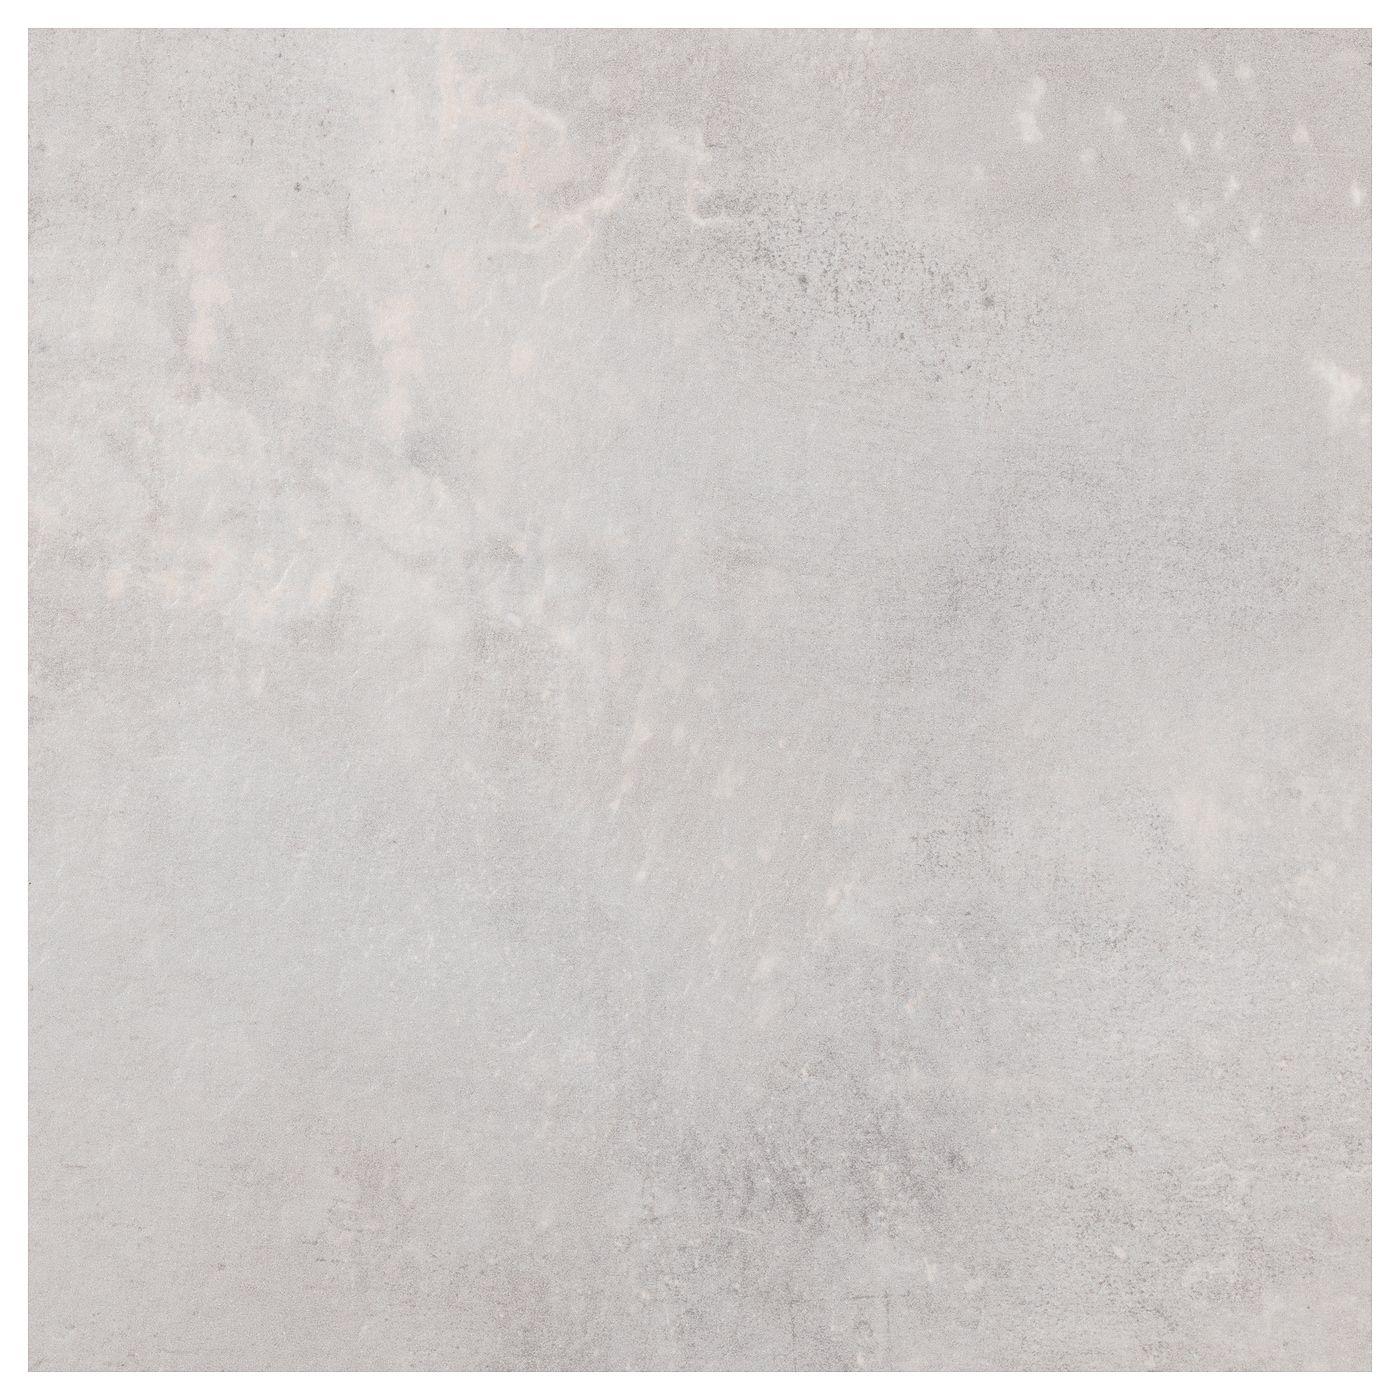 Ekbacken Countertop Light Gray Concrete Effect Laminate 98x1 1